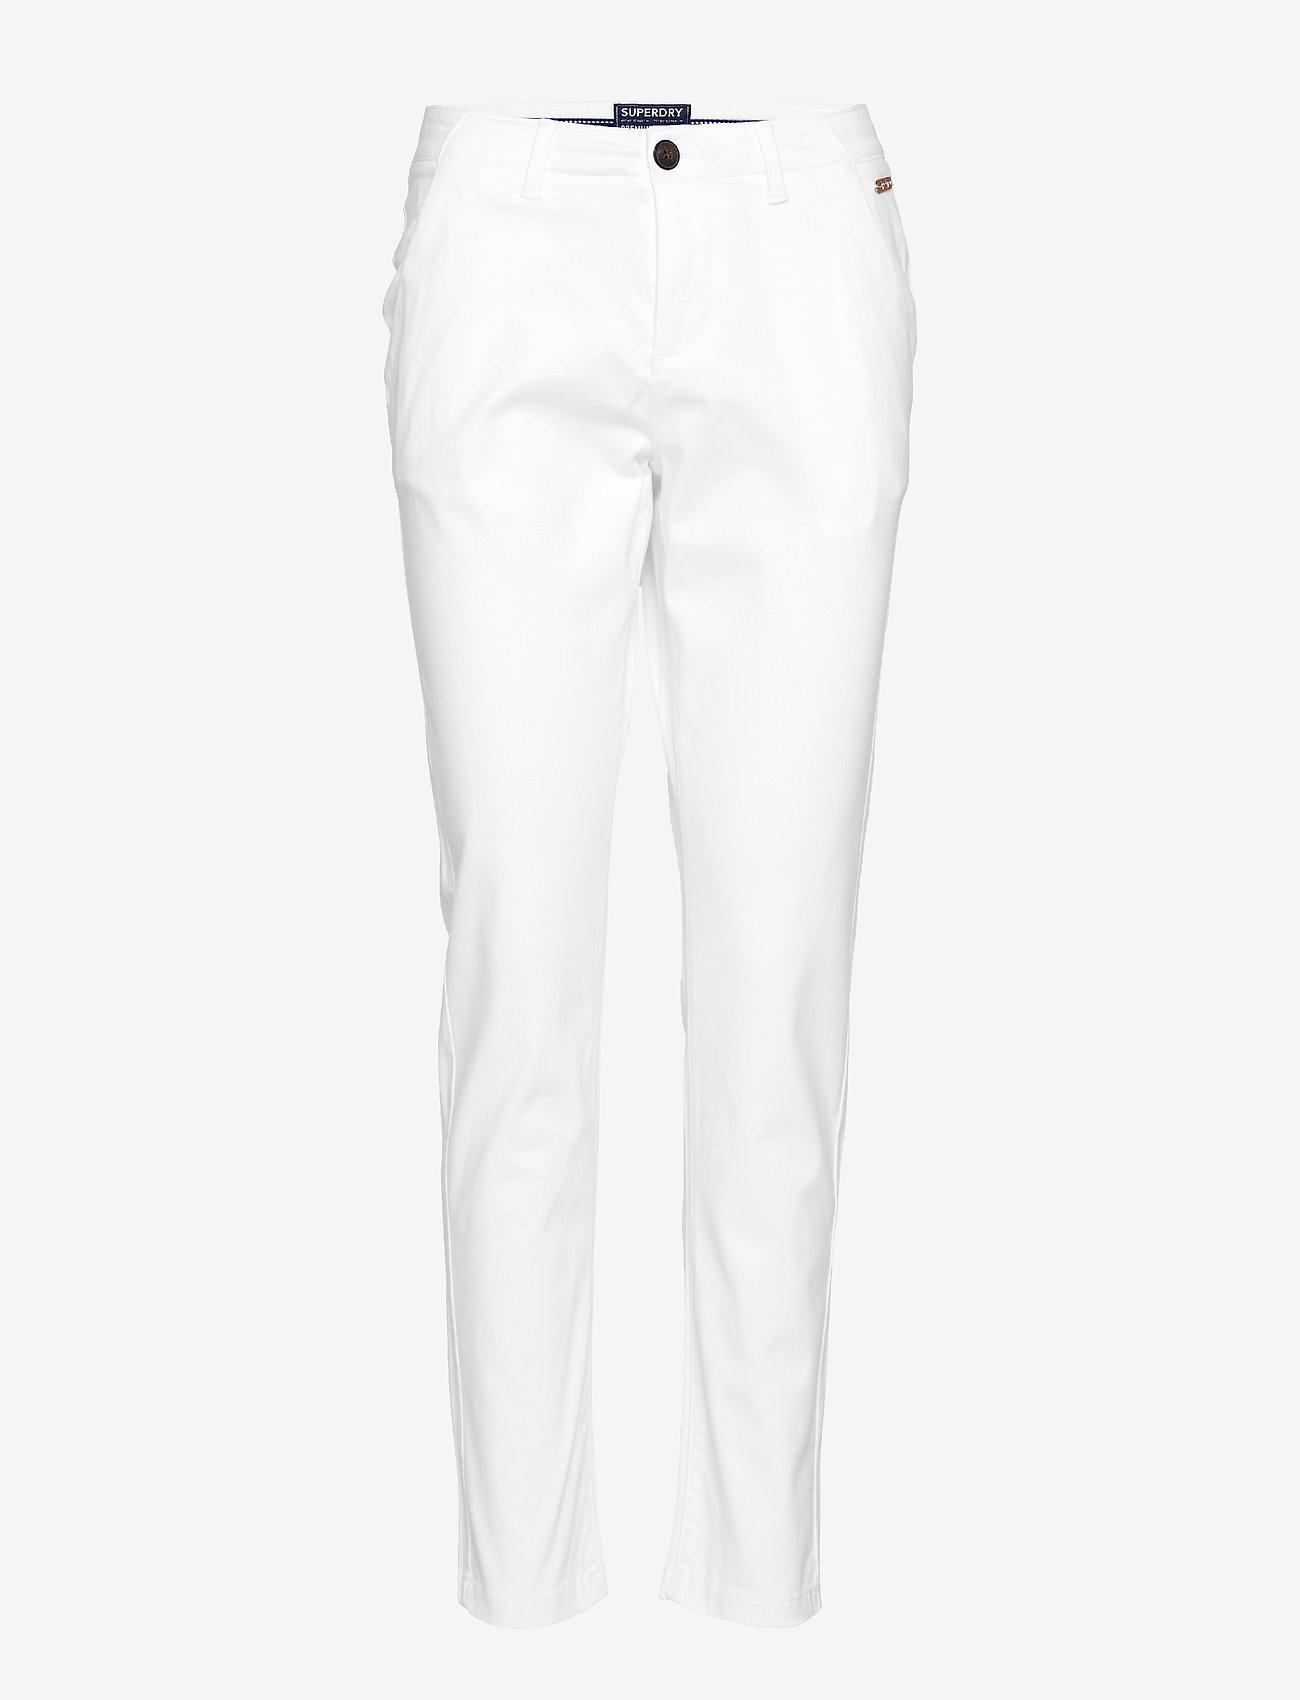 City Chino Pant (Optic White) (21 €) - Superdry Wppt0